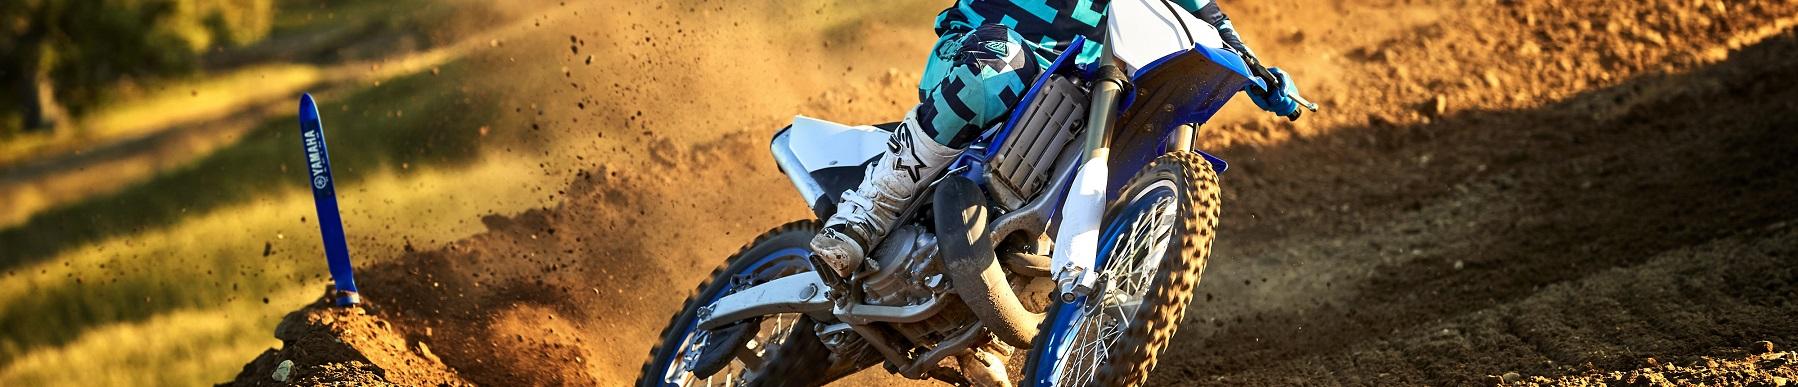 Yamaha YZ250 - MotorCentrumWest